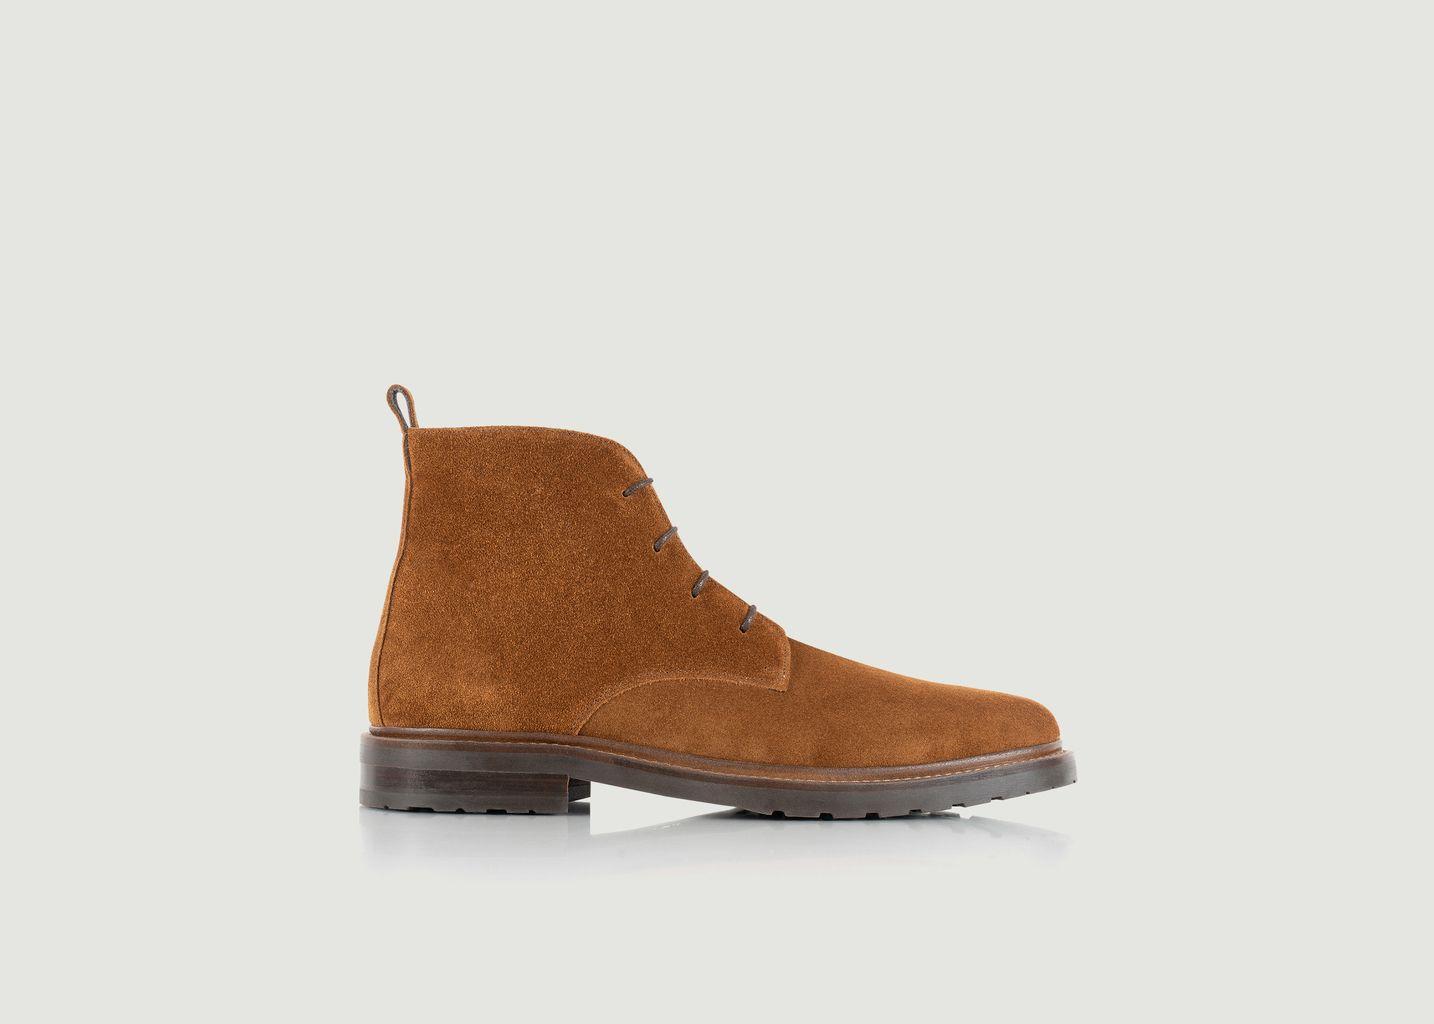 Boots Inglewood - Bobbies Paris